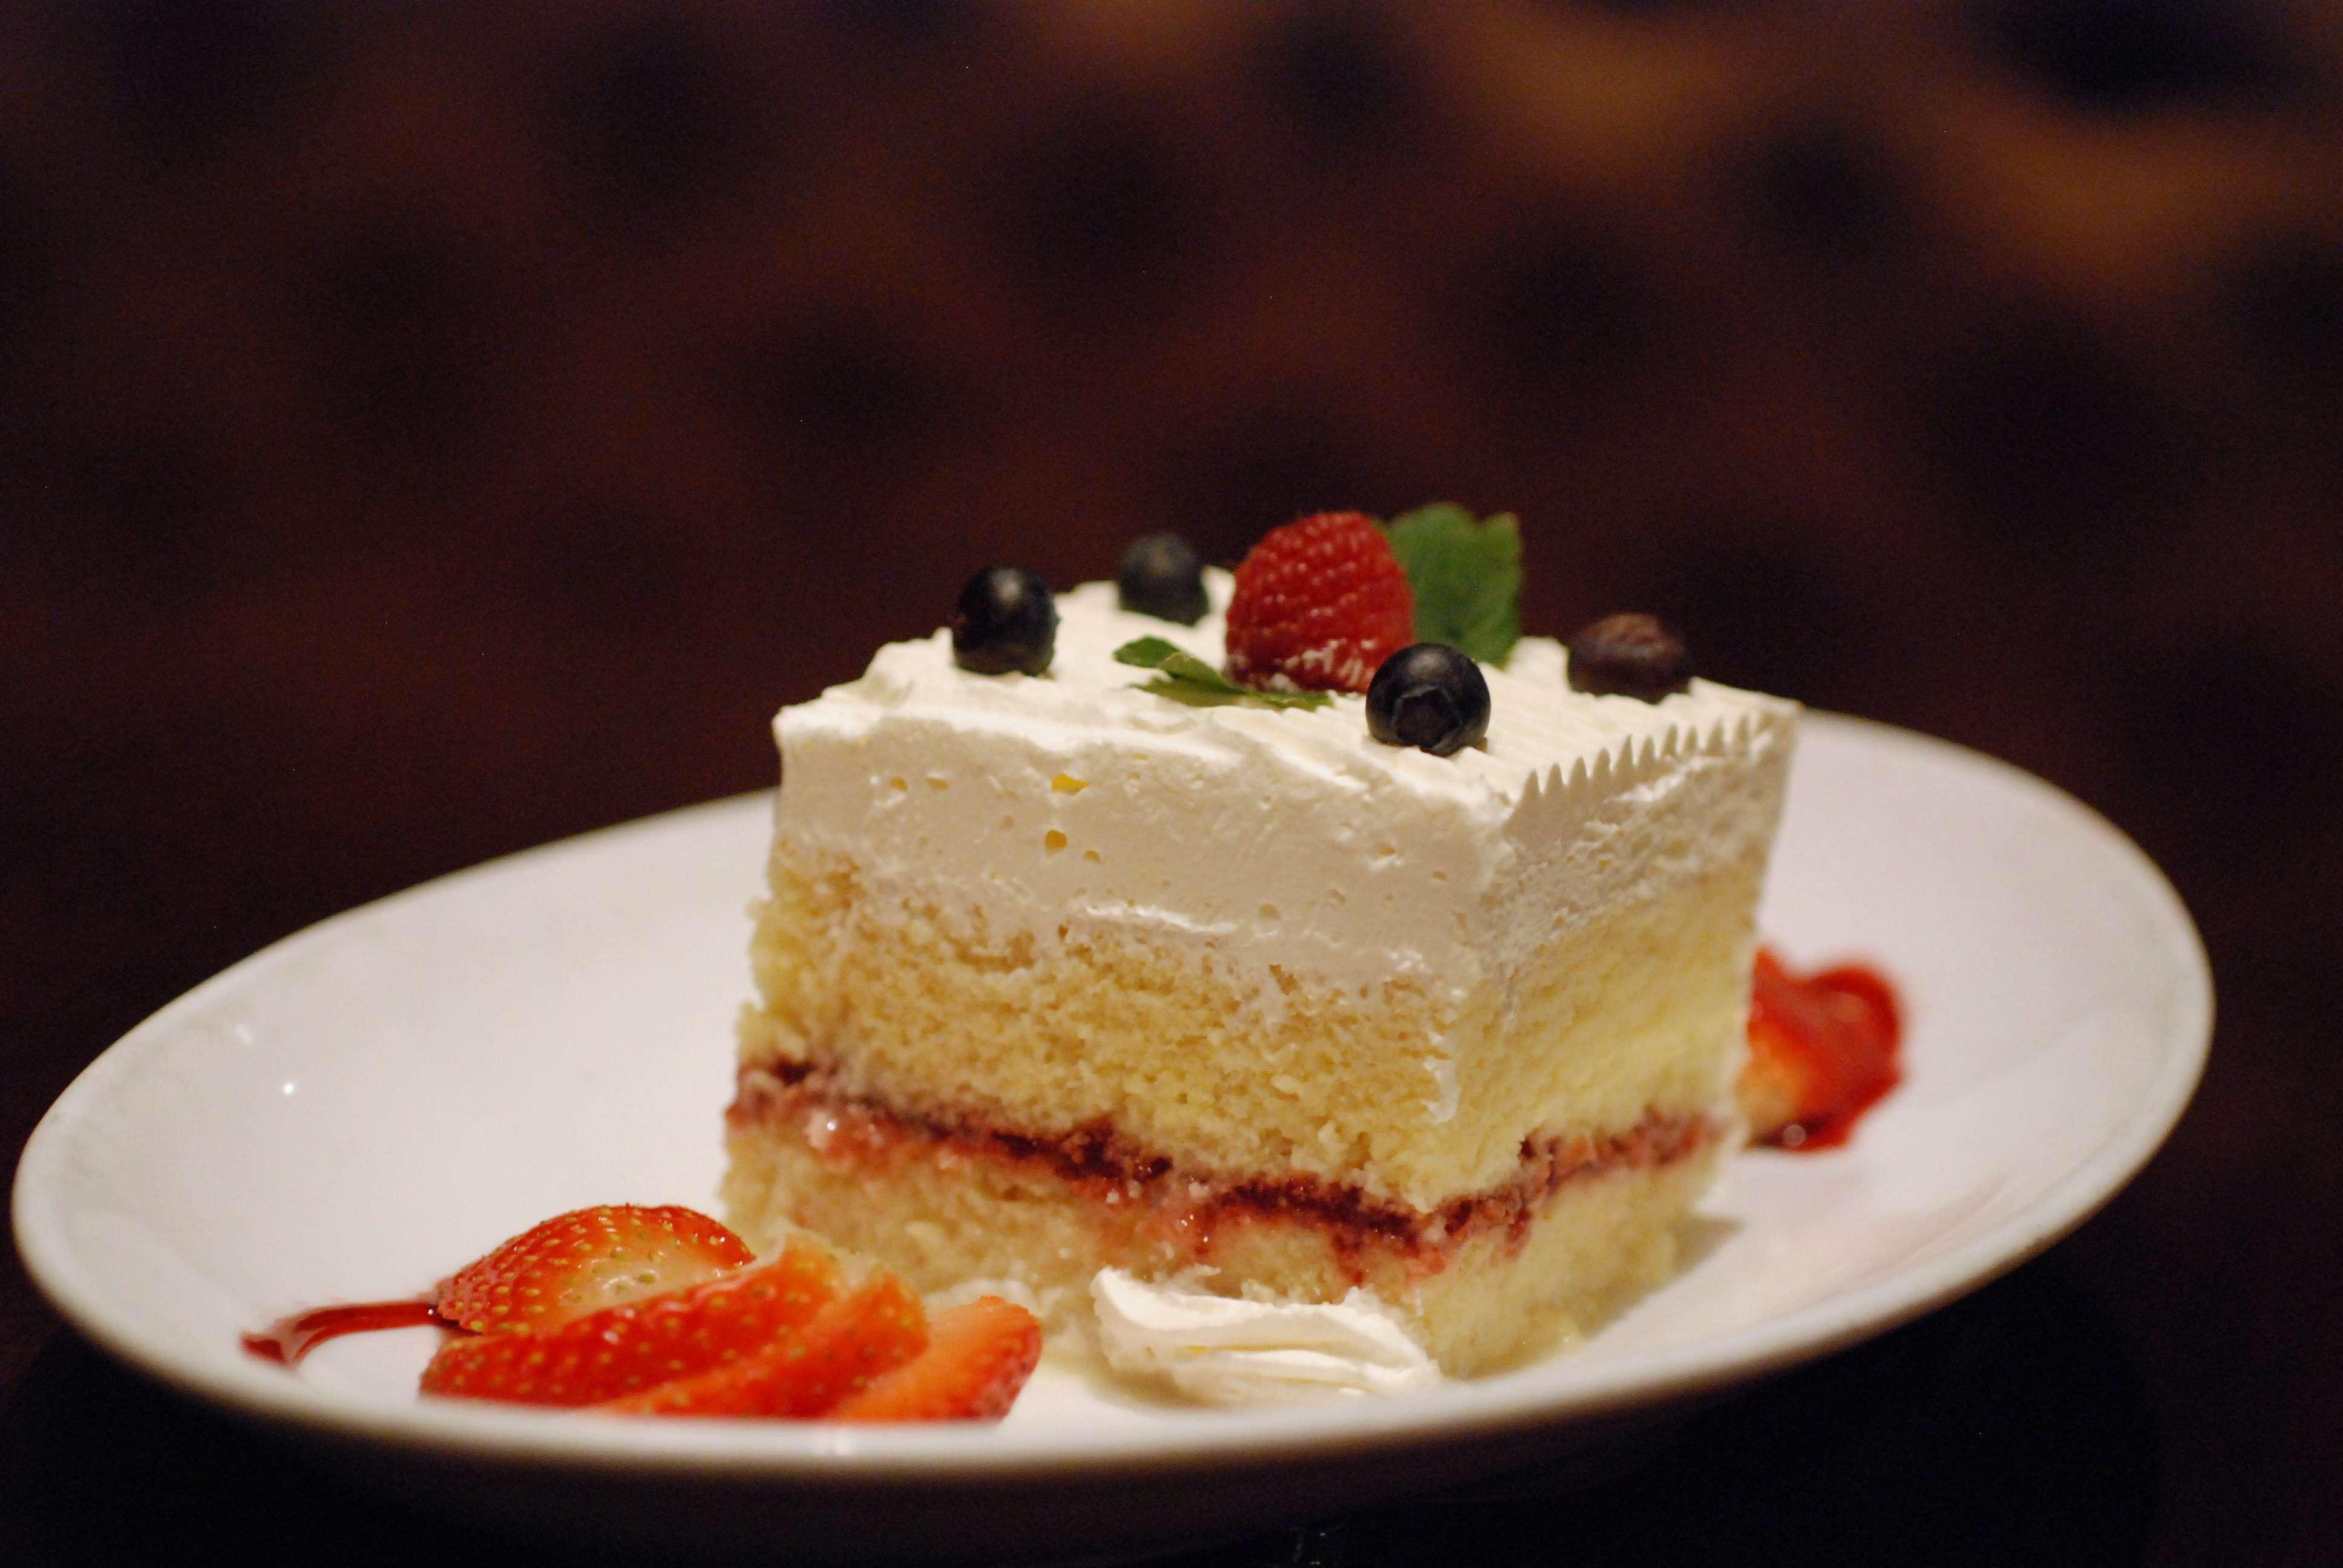 Upside Down Cake Company (UDC)